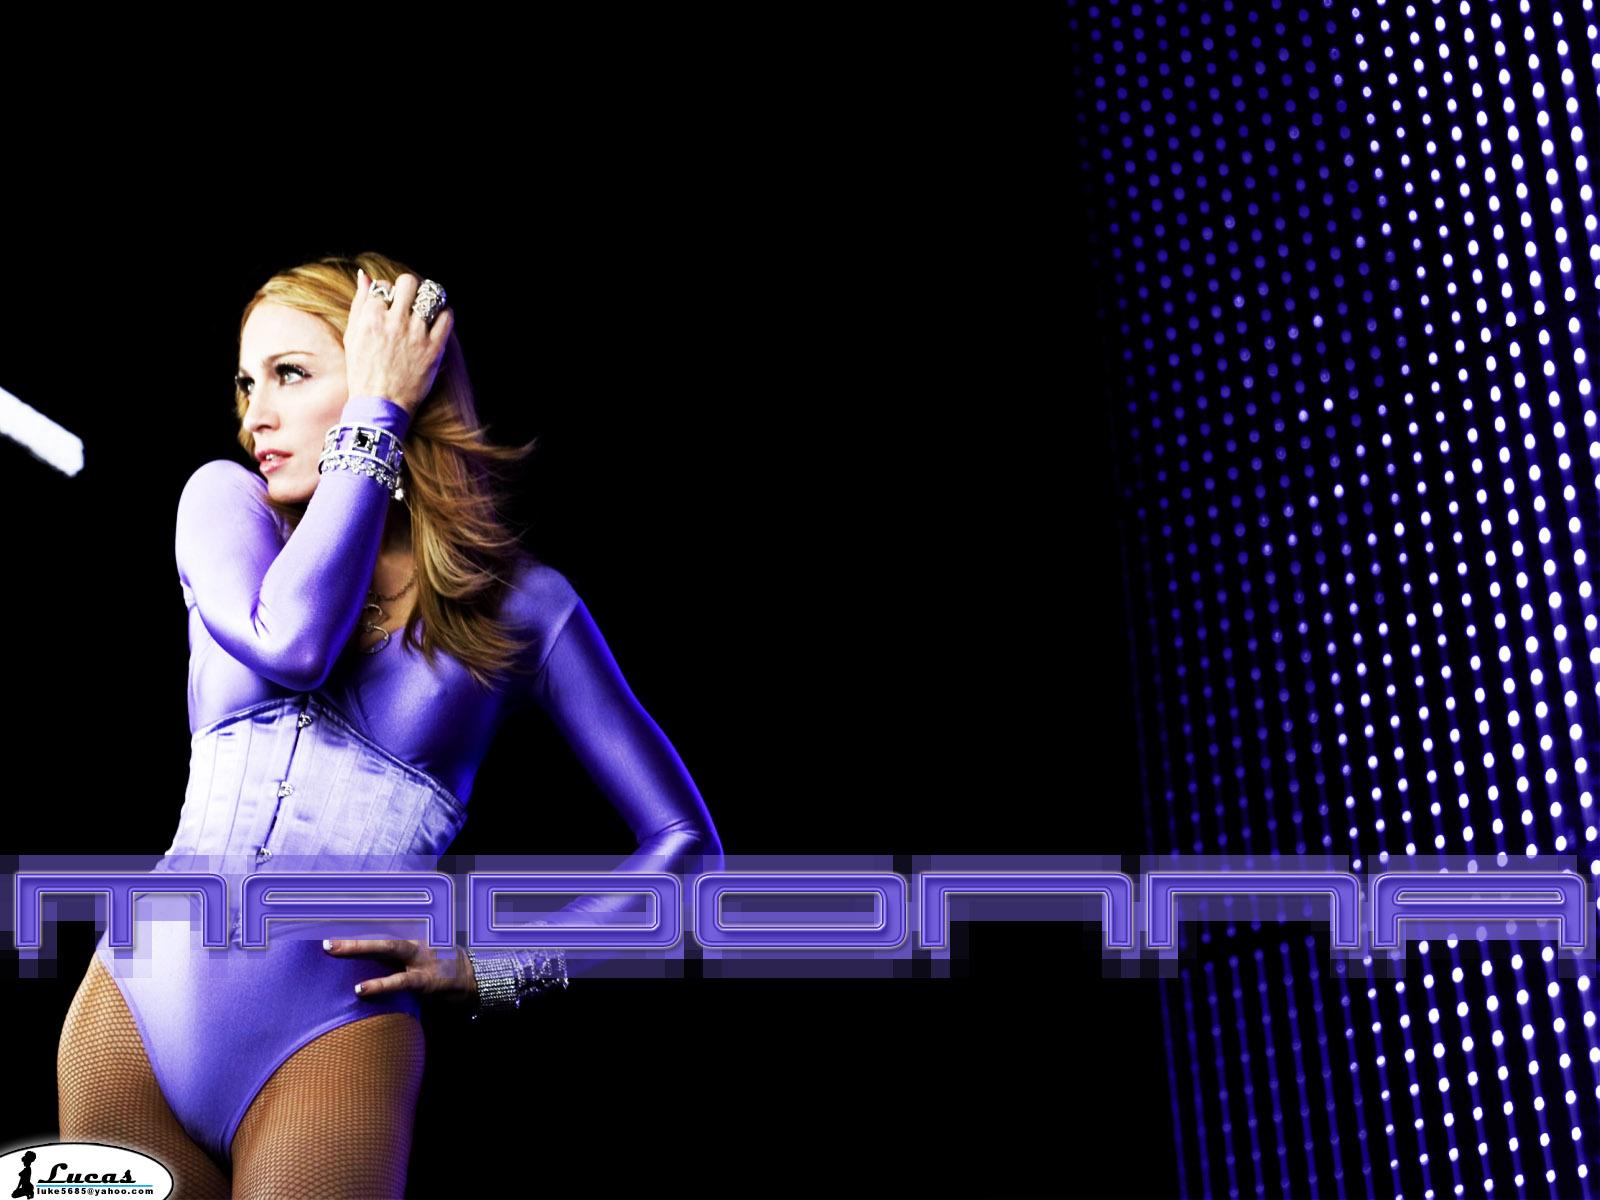 Free madonna wallpapers wallpapersafari - Madonna hd images ...